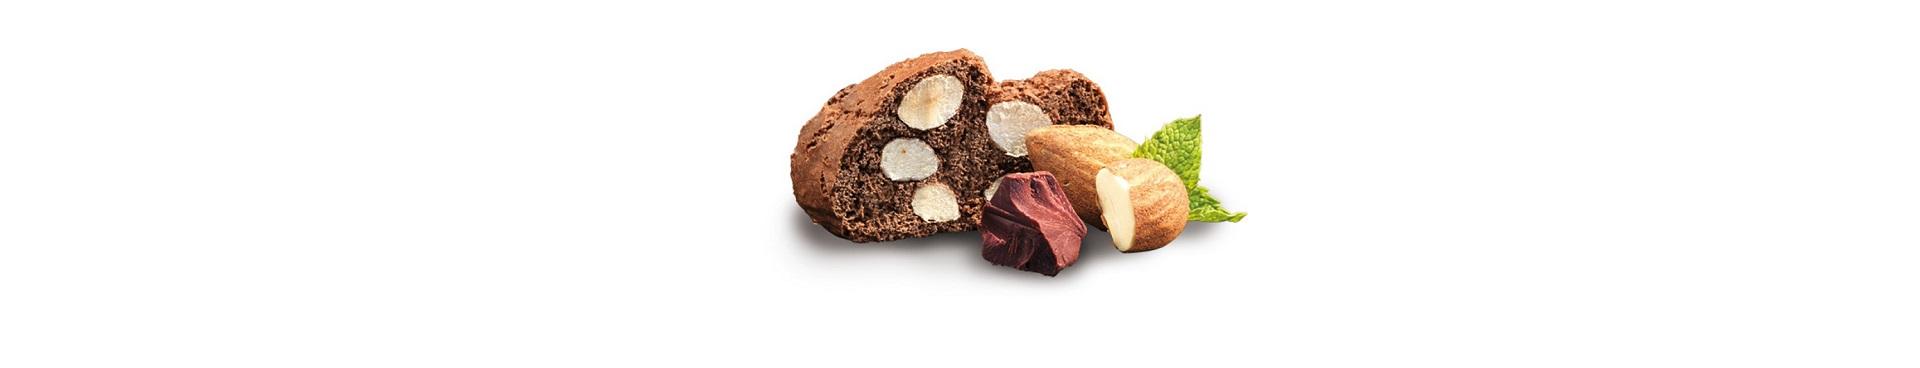 Carquinyolis Artesanos Cacao con Almendras destacada